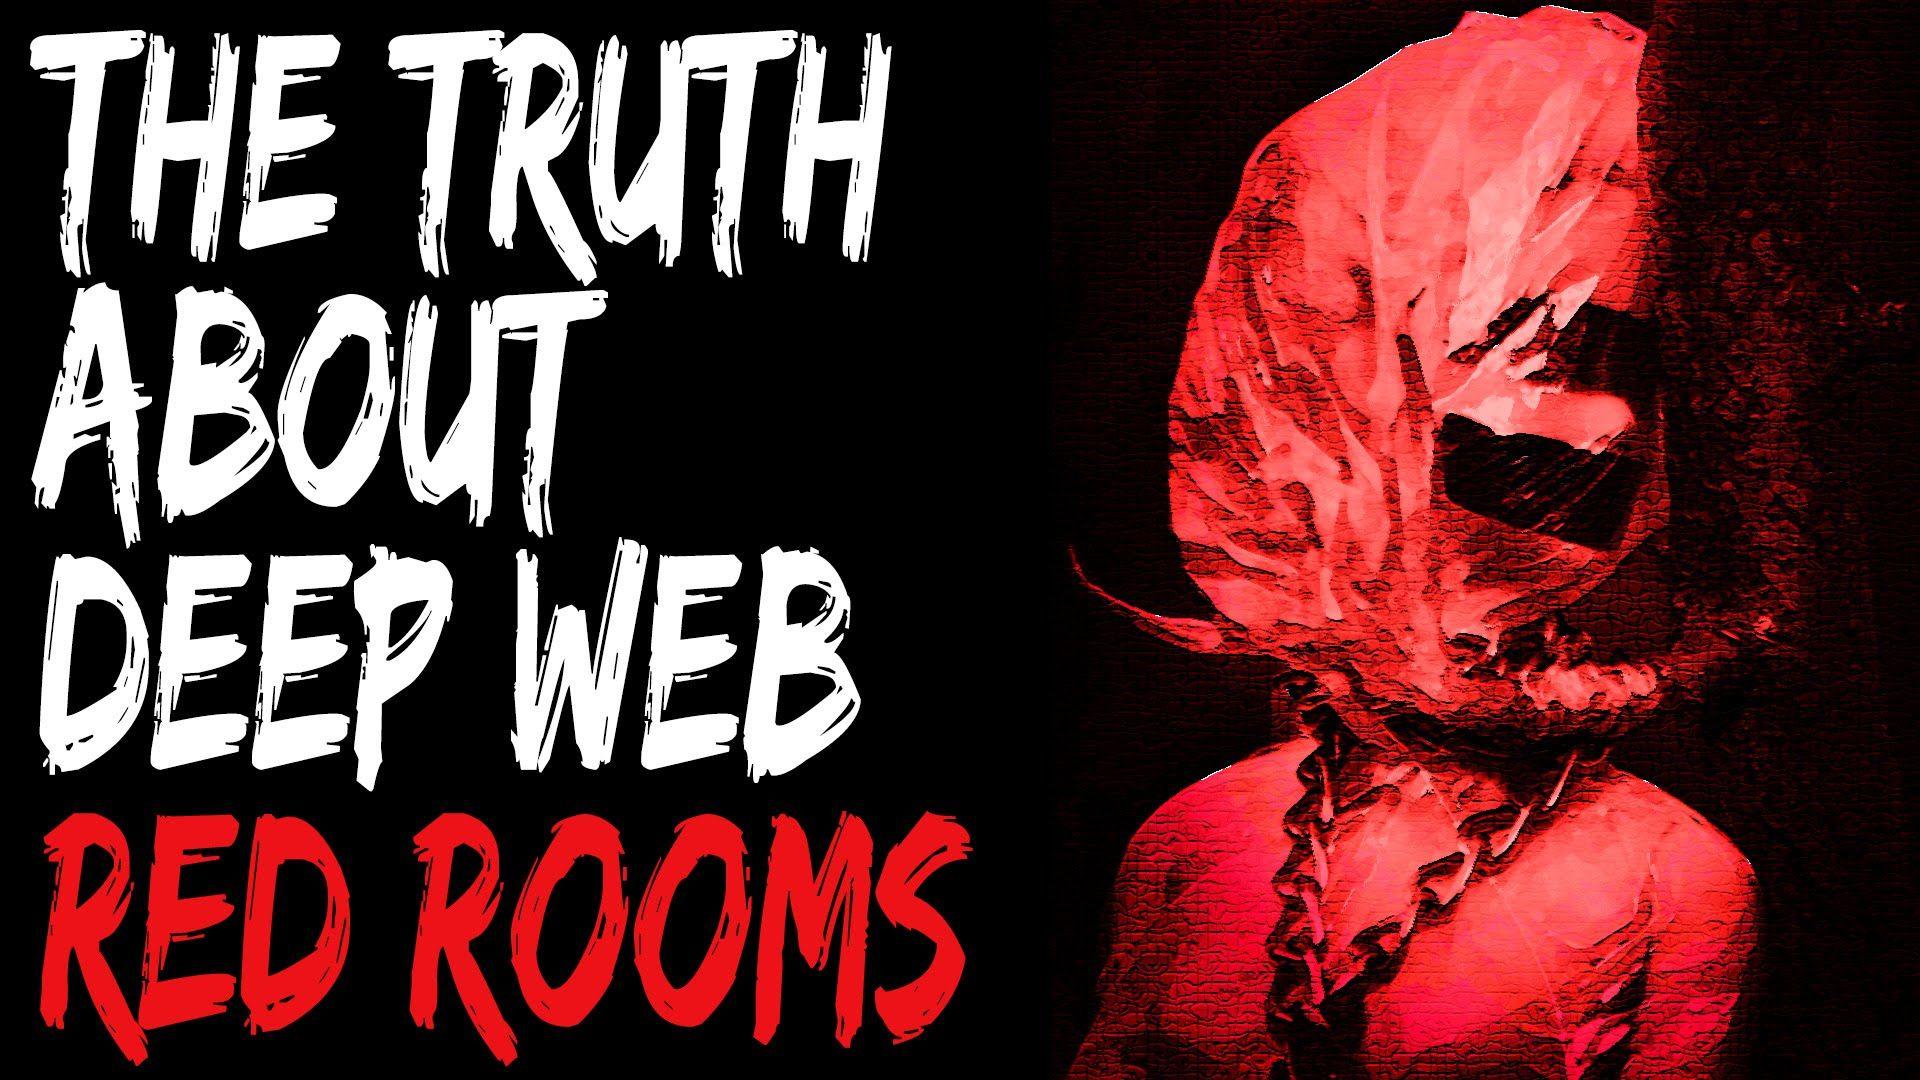 Red Rooms Situs Mengerikan Deep Web, Nyata atau Mitos?